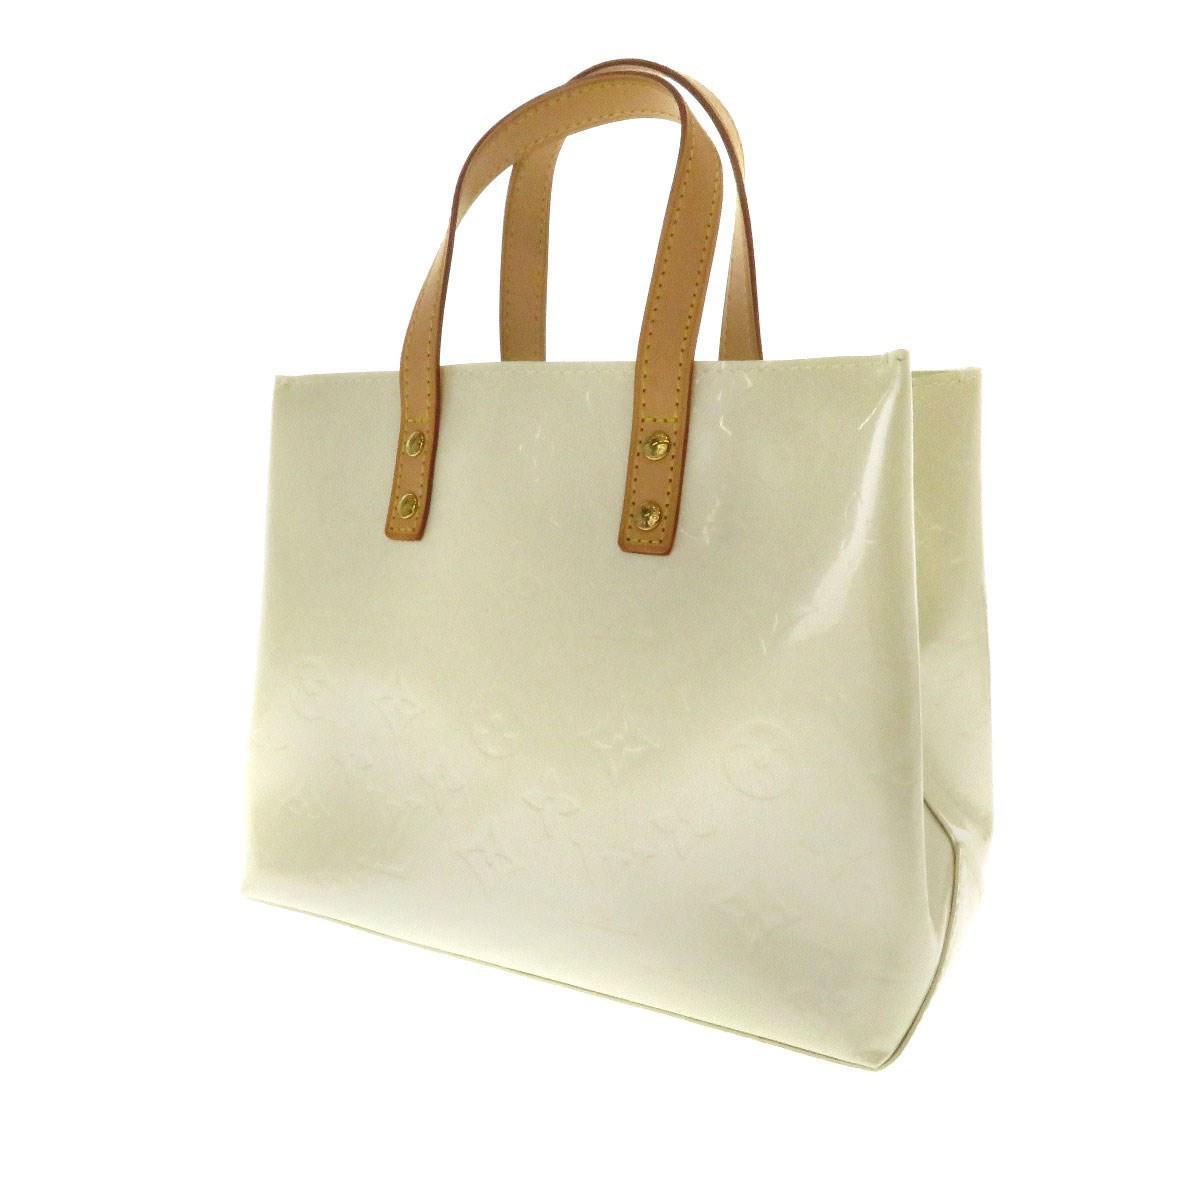 2dc04e5d08 Louis Vuitton Vernis Tote Bag Lead Pm M91336 in White - Lyst